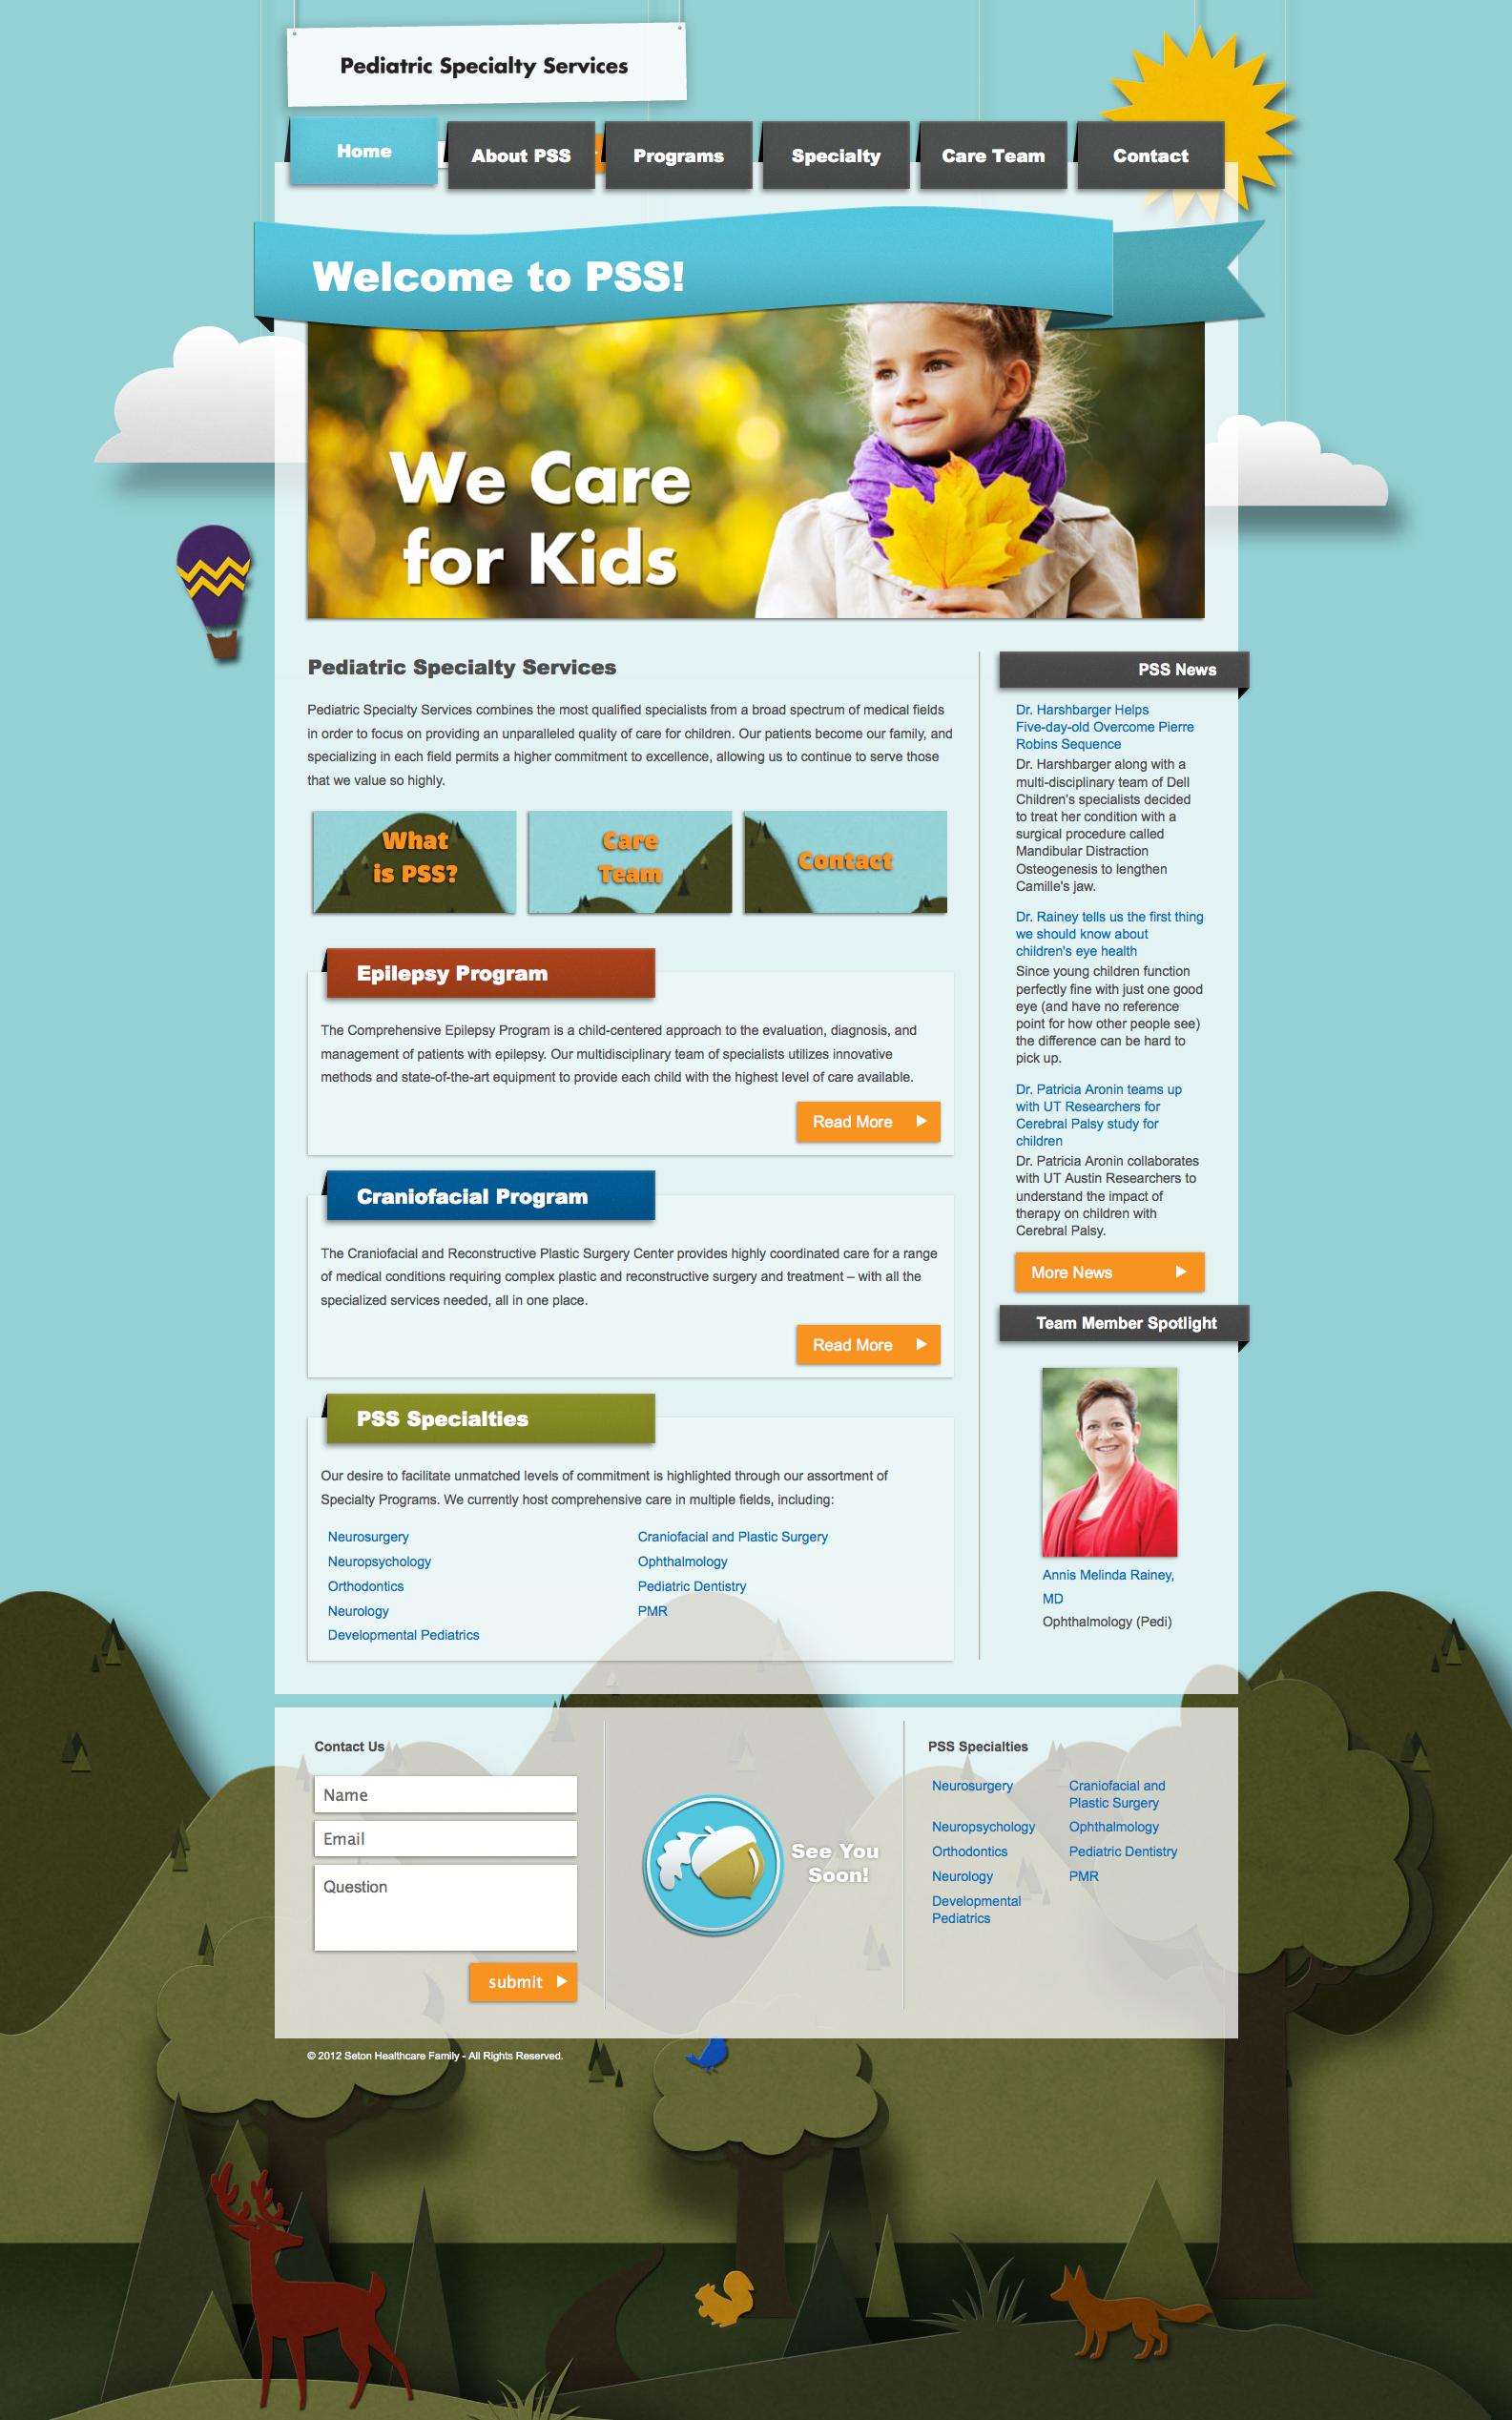 Pin By Damjan Jovanovski On Web Design Inspiration Pediatric Specialties Web Design Inspiration Pediatrics